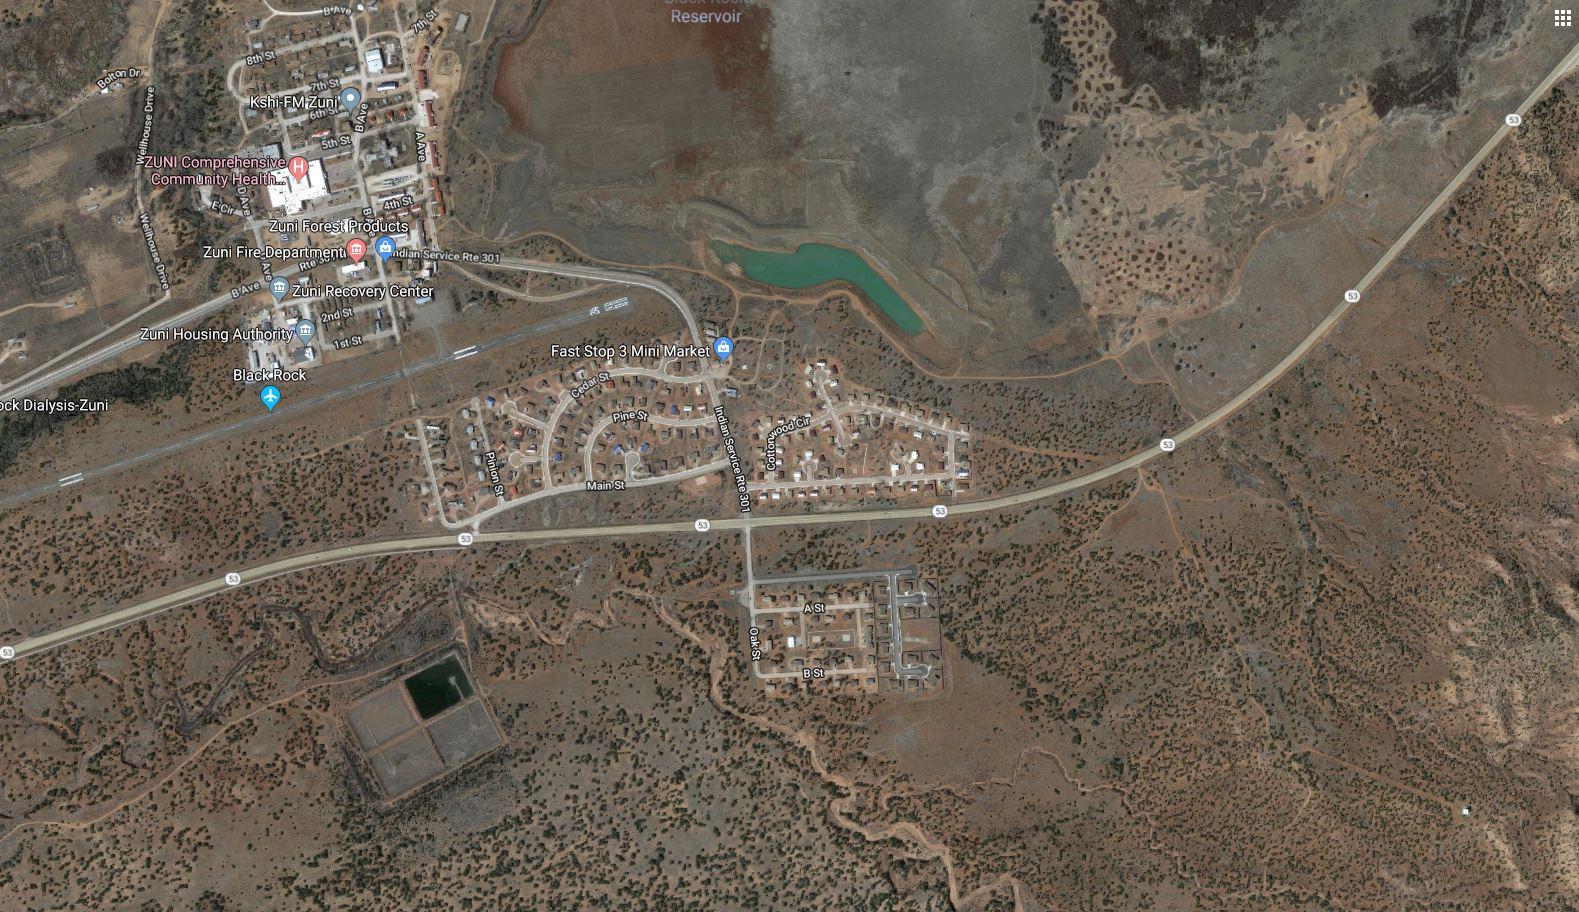 Zuni Housing Authority - I.H.S. Housing